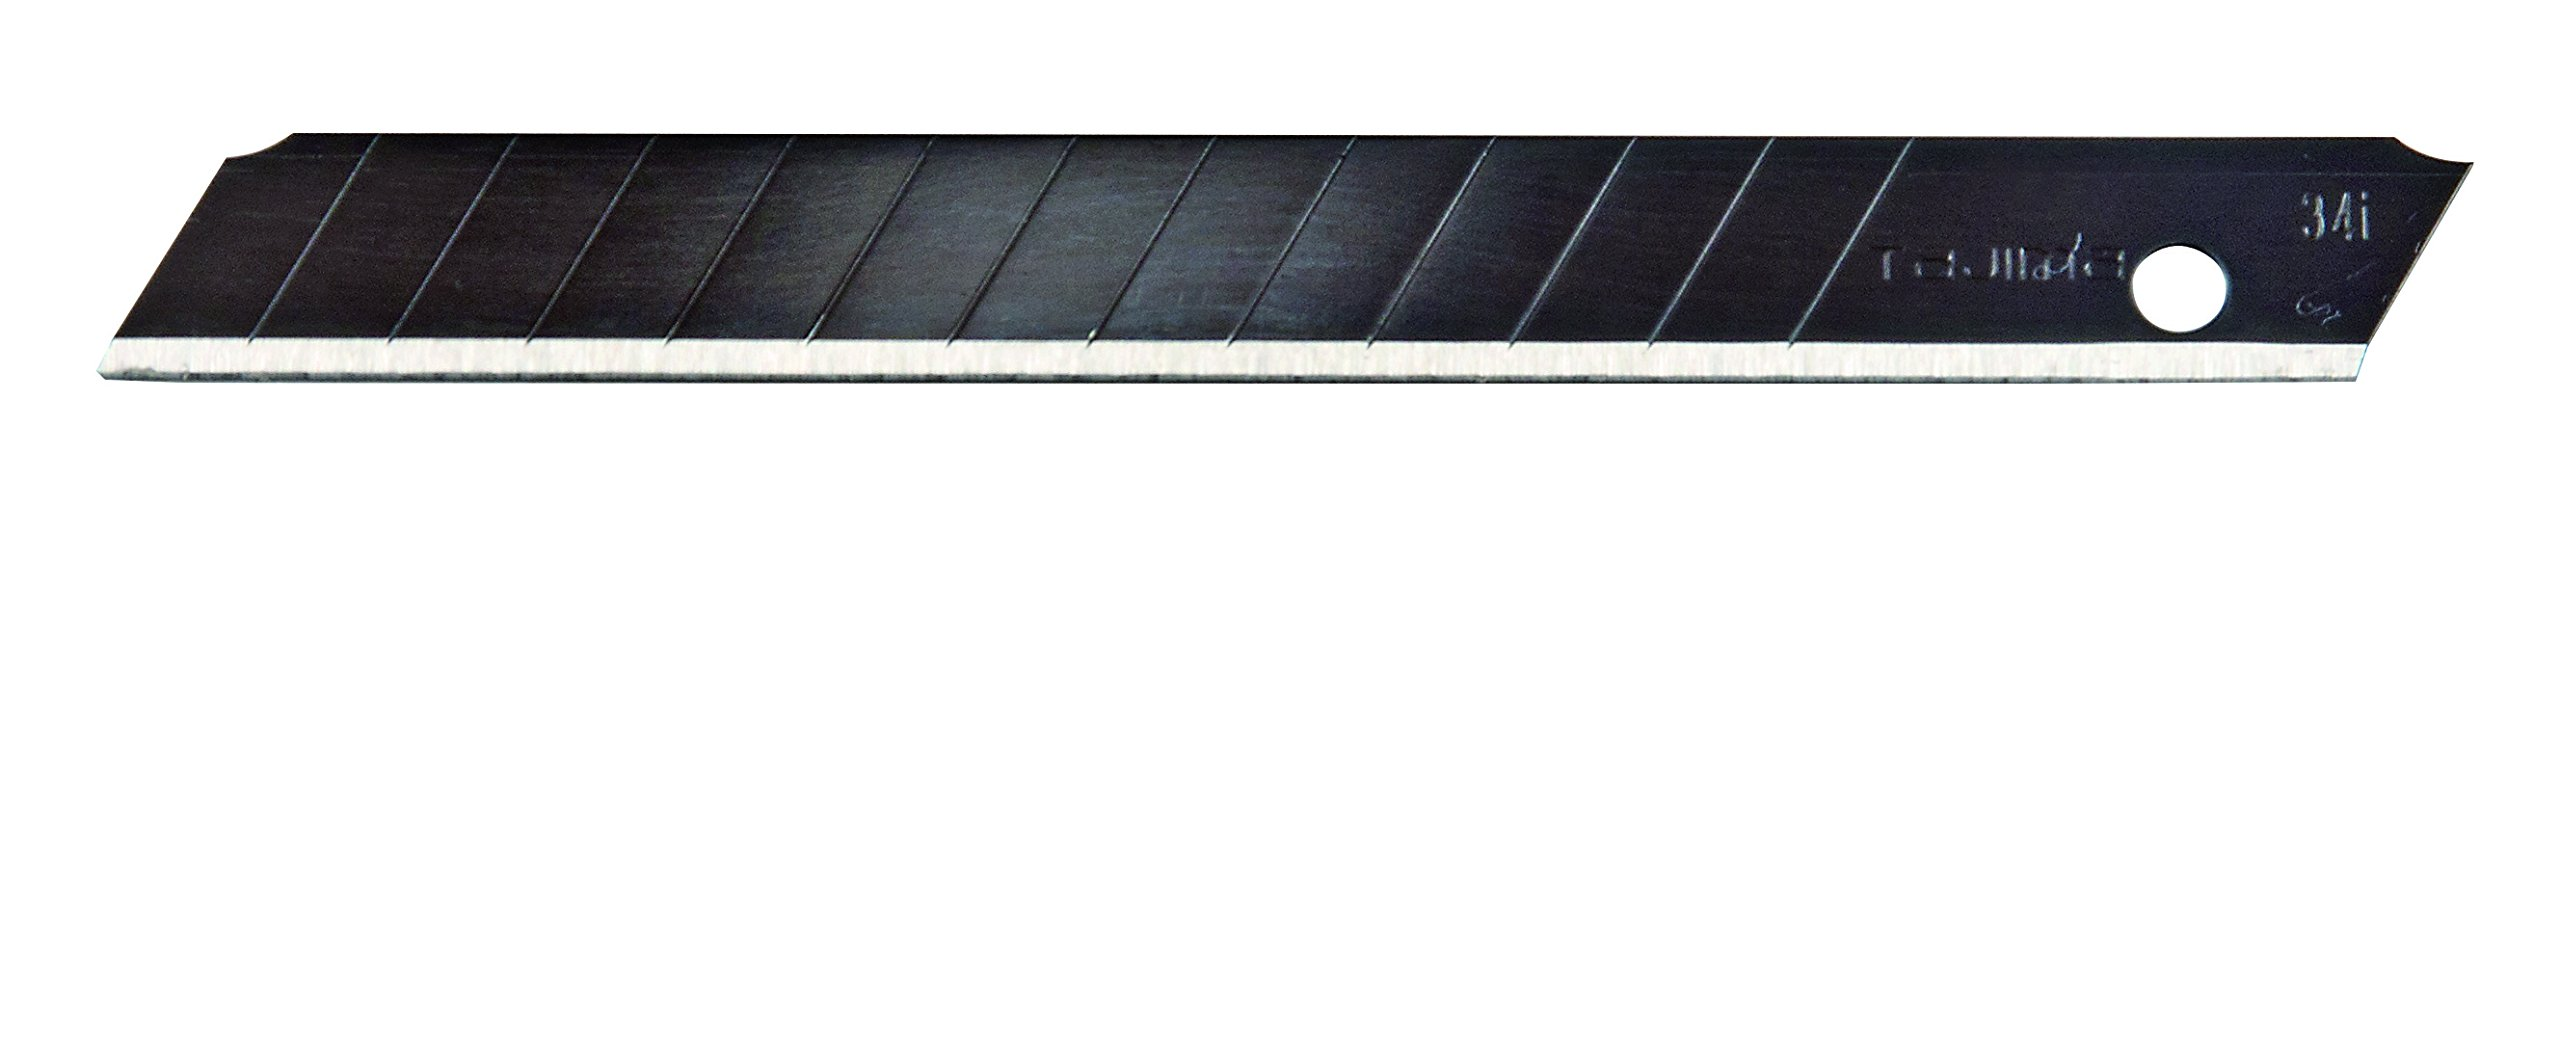 TAJIMA Utility Knives & Blades - 10-pack